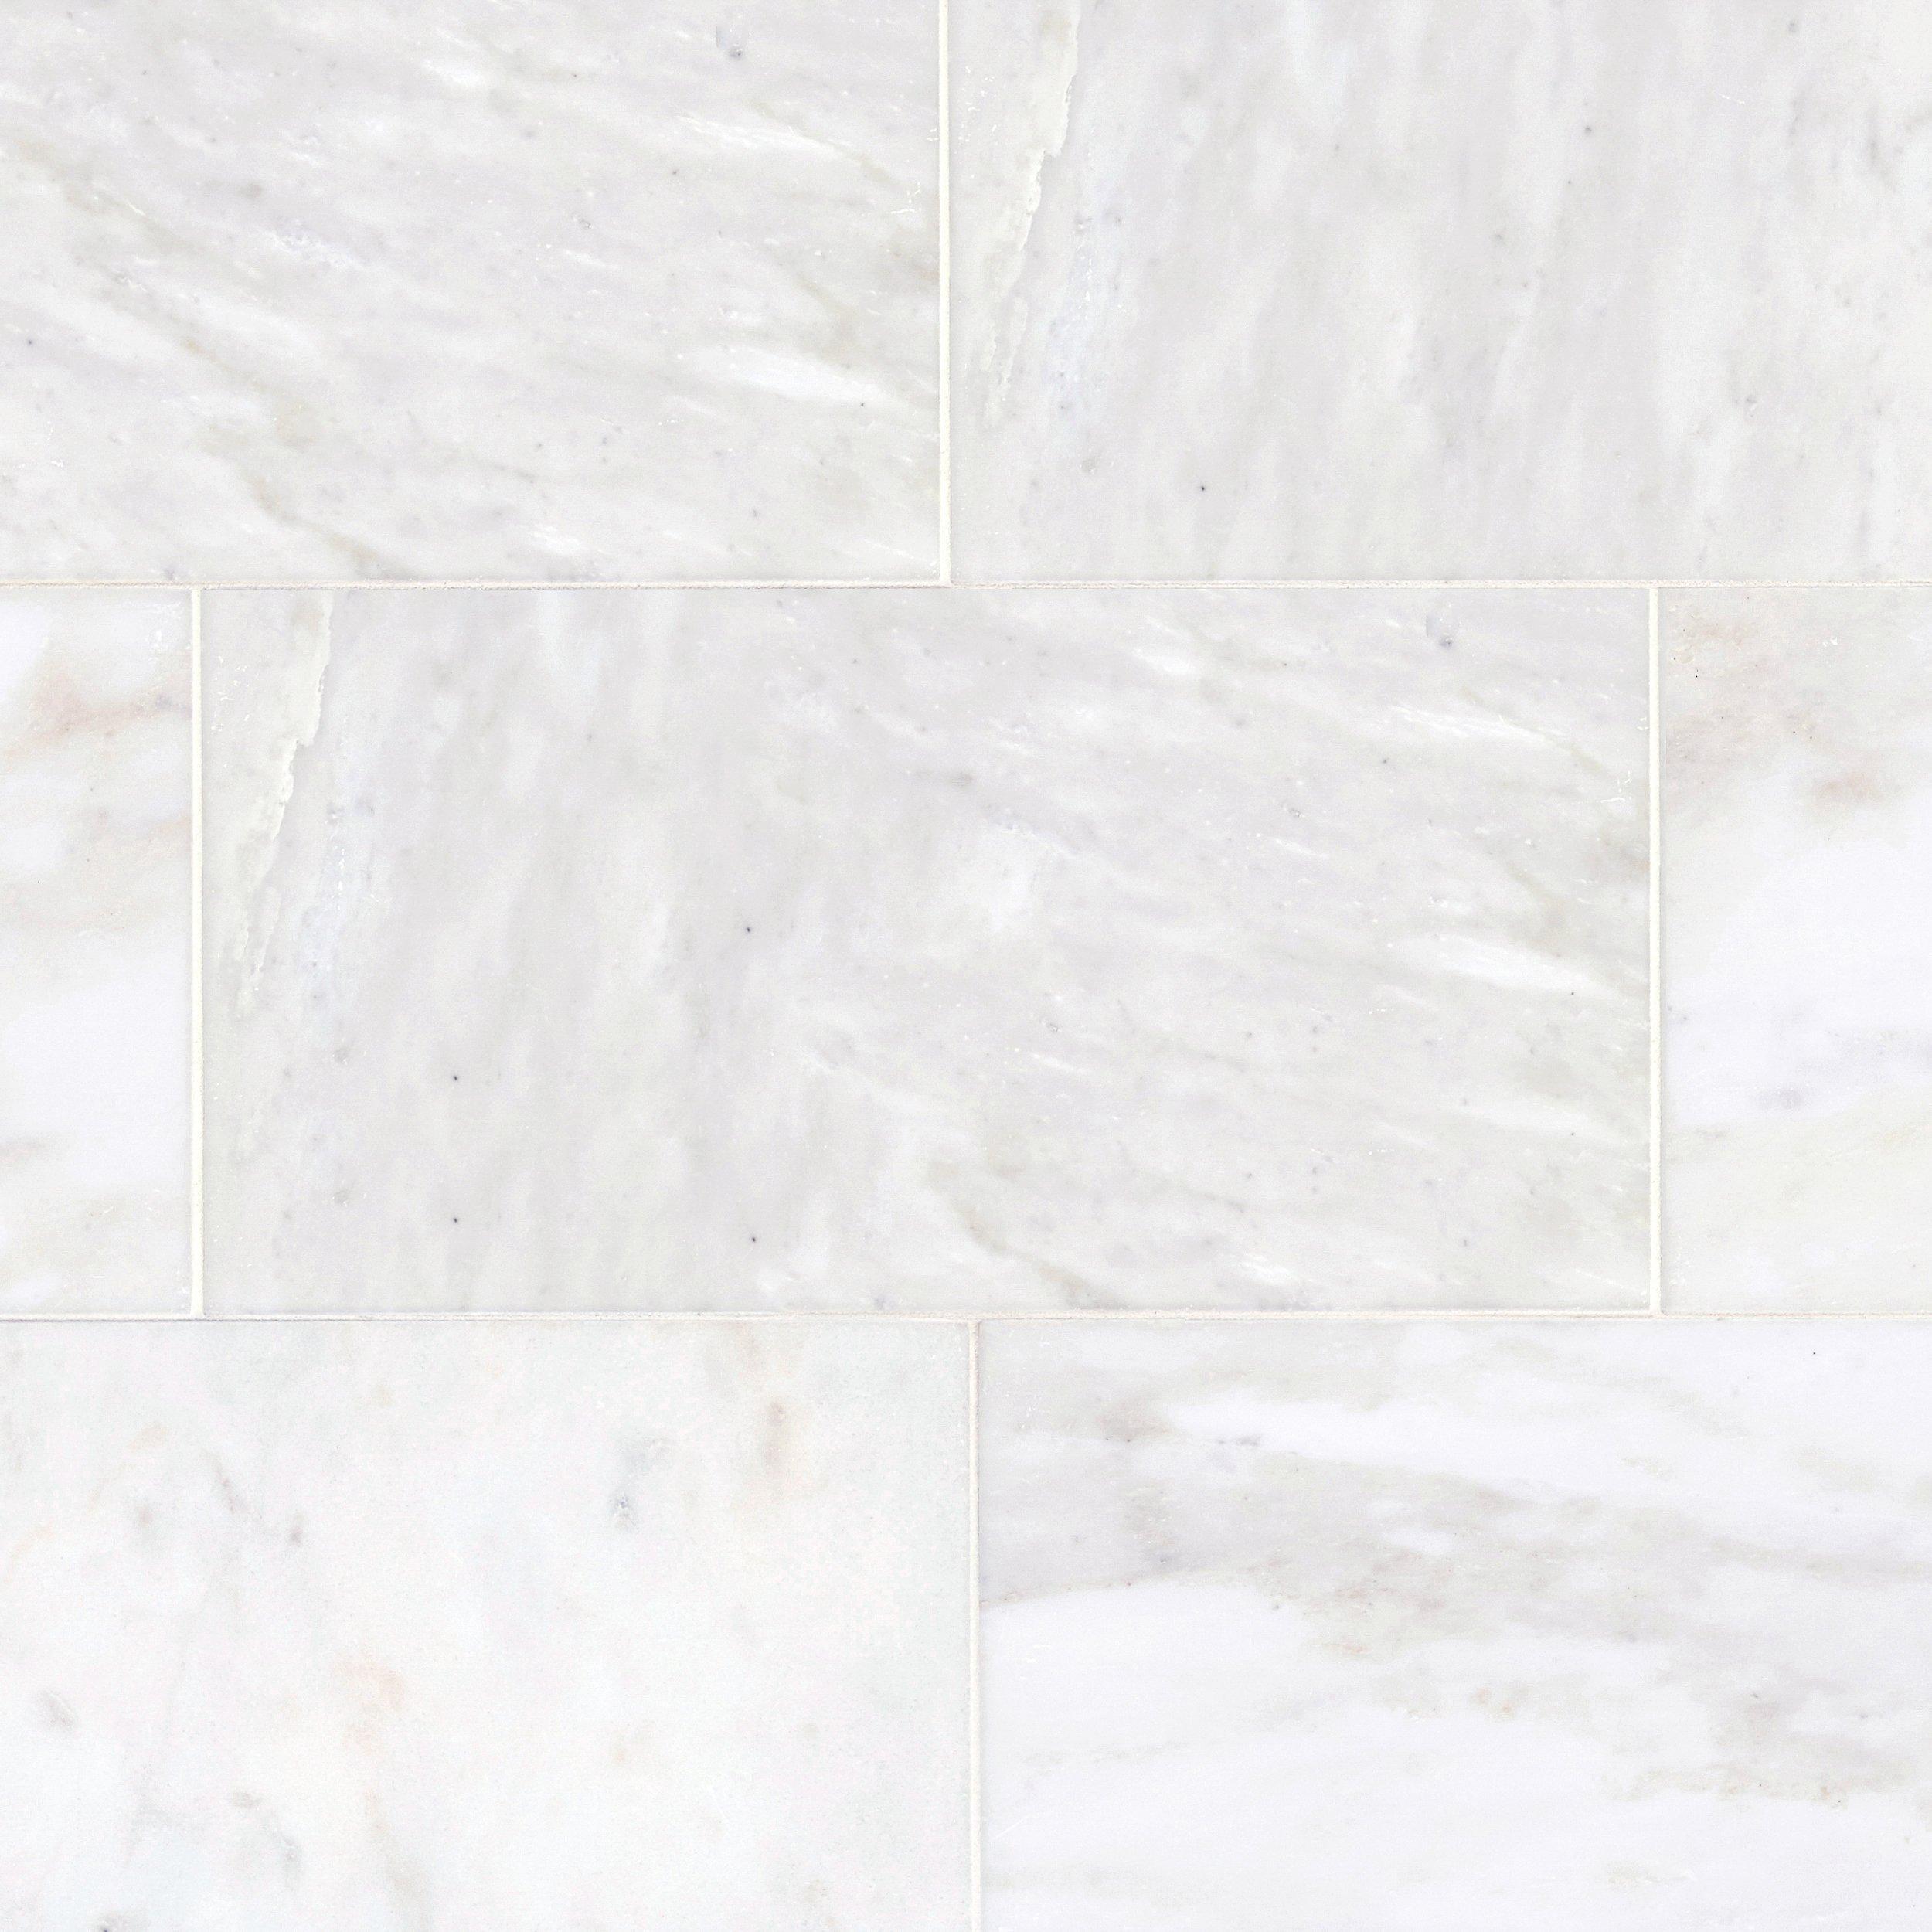 White marble tile flooring Seamless Carrara White Polished Marble Tile Ifmresourceinfo Carrara White Polished Marble Tile 12 24 921100409 Floor And